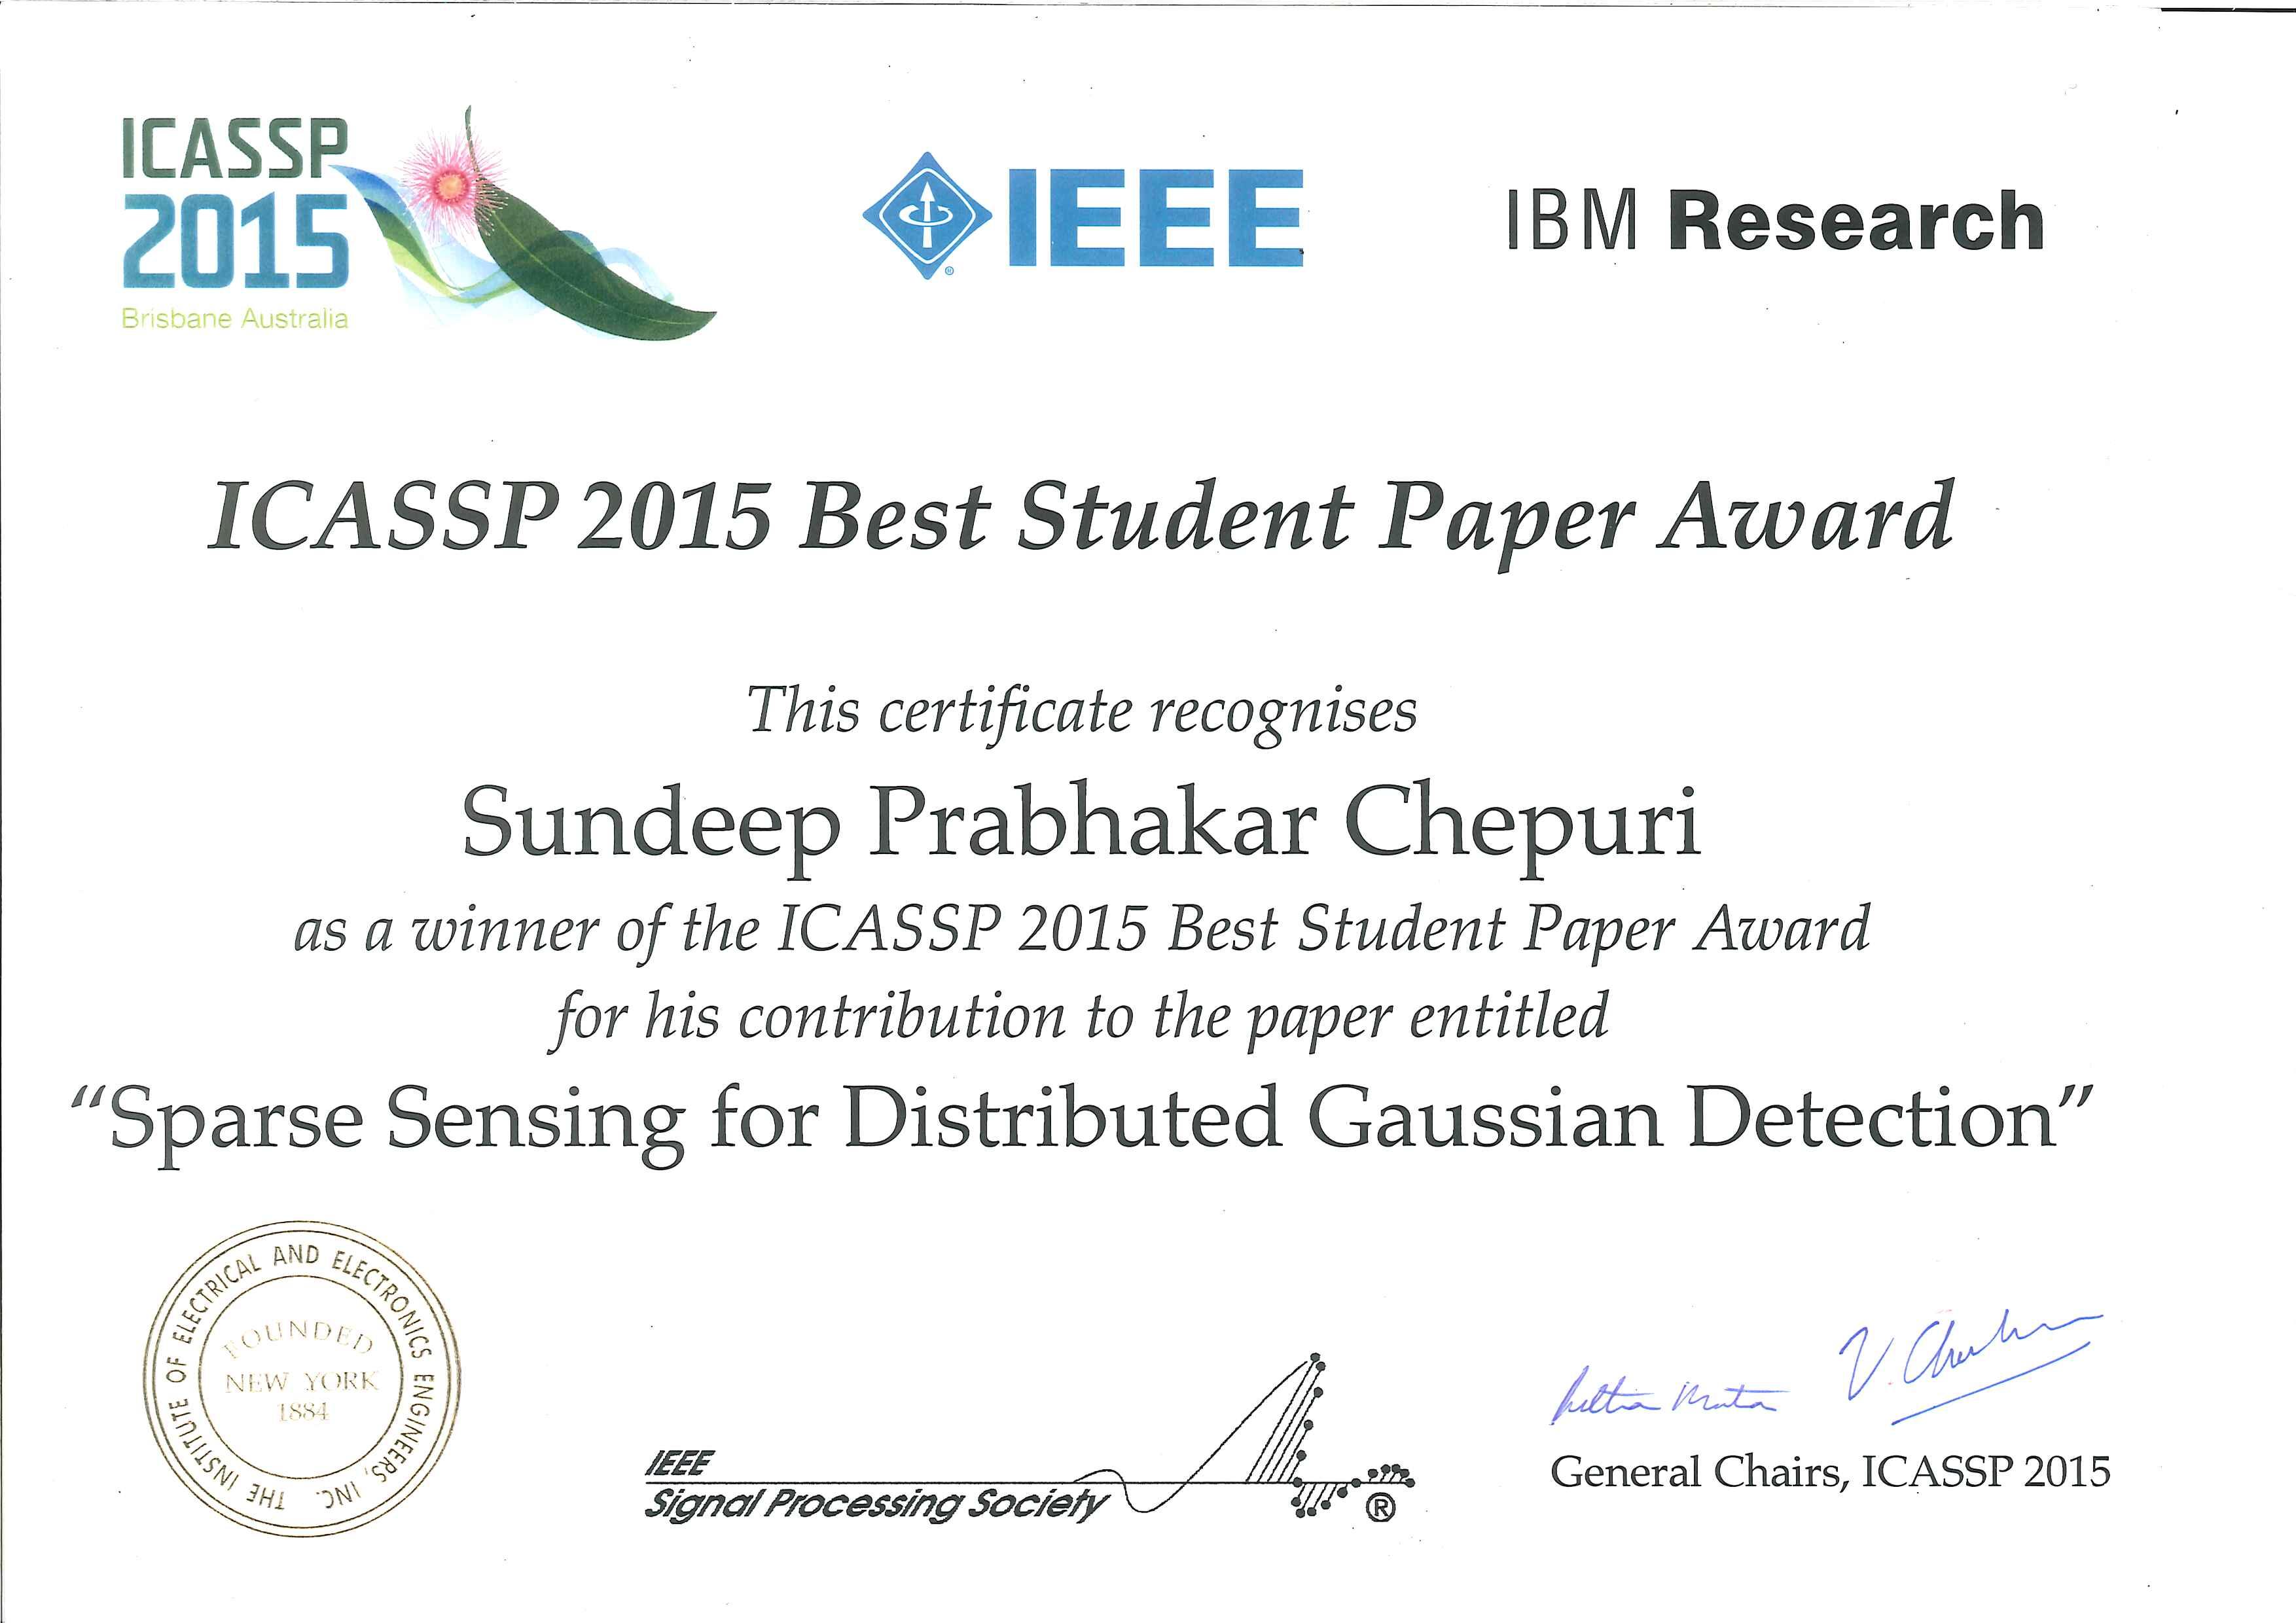 Sundeep Prabhakar Chepuri